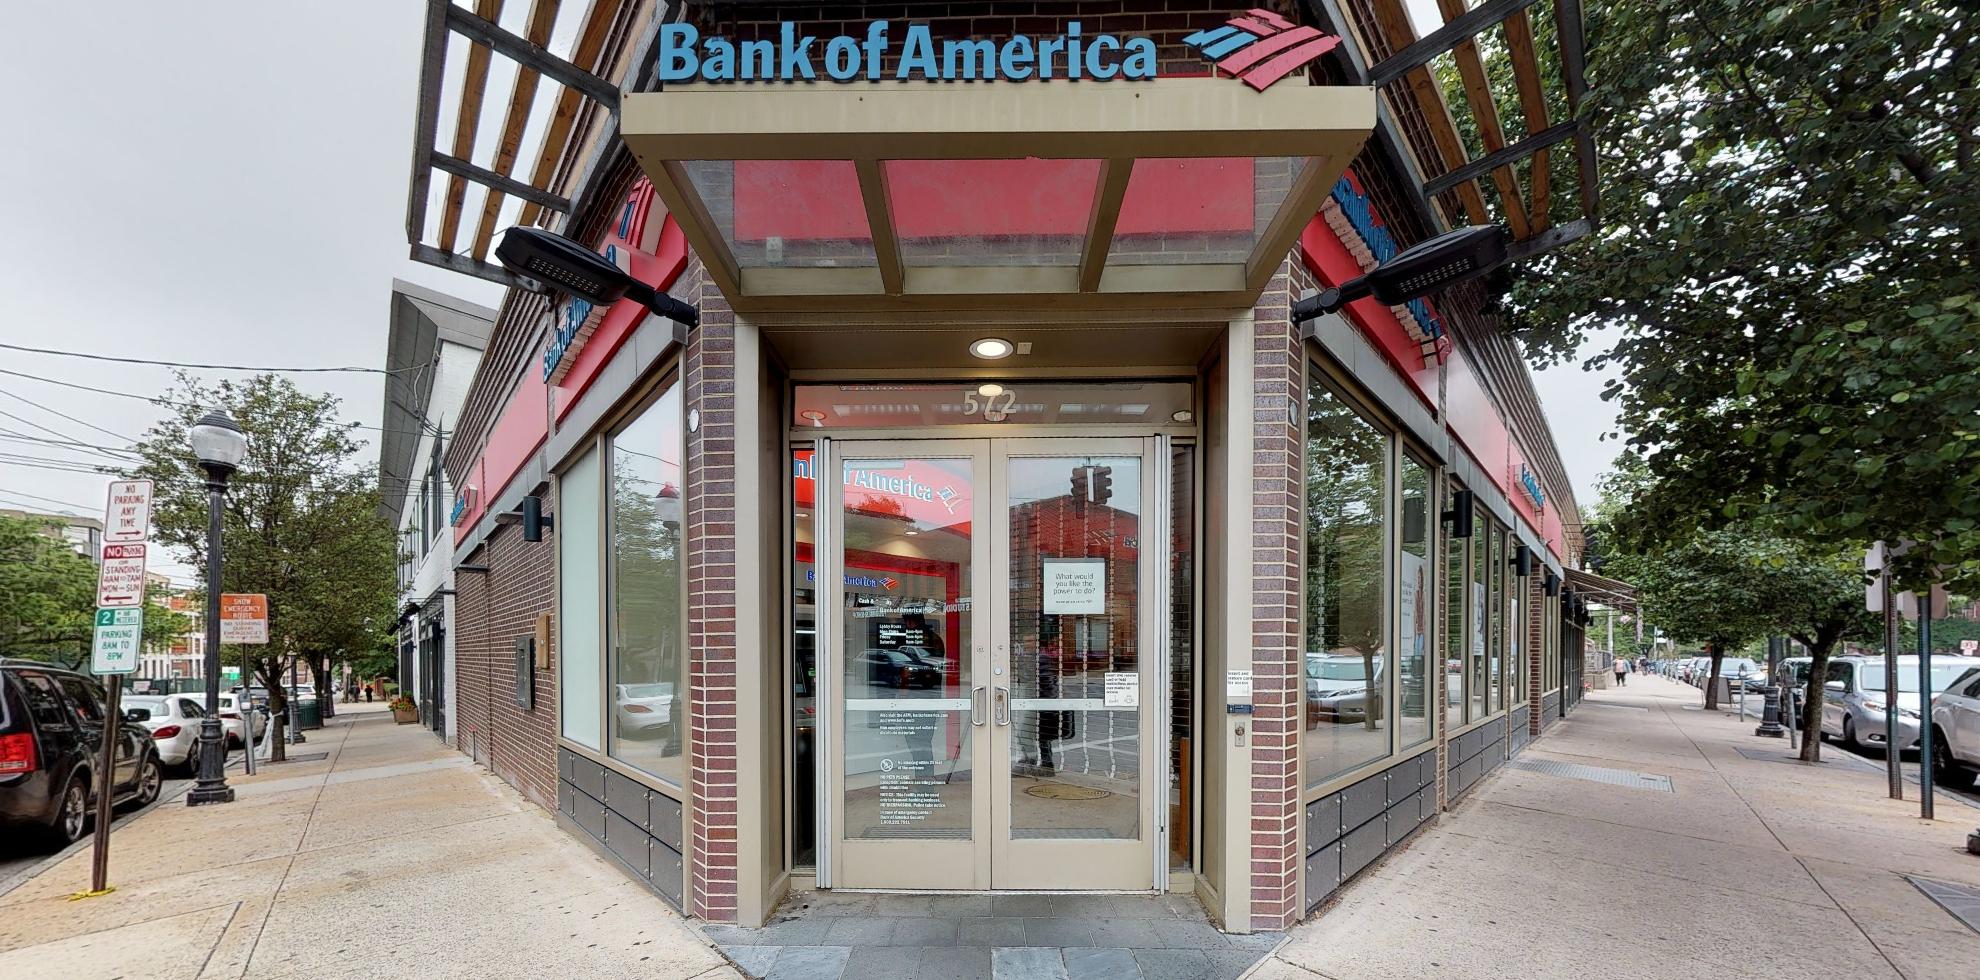 Bank of America financial center with walk-up ATM   572 Gramatan Ave, Mount Vernon, NY 10552